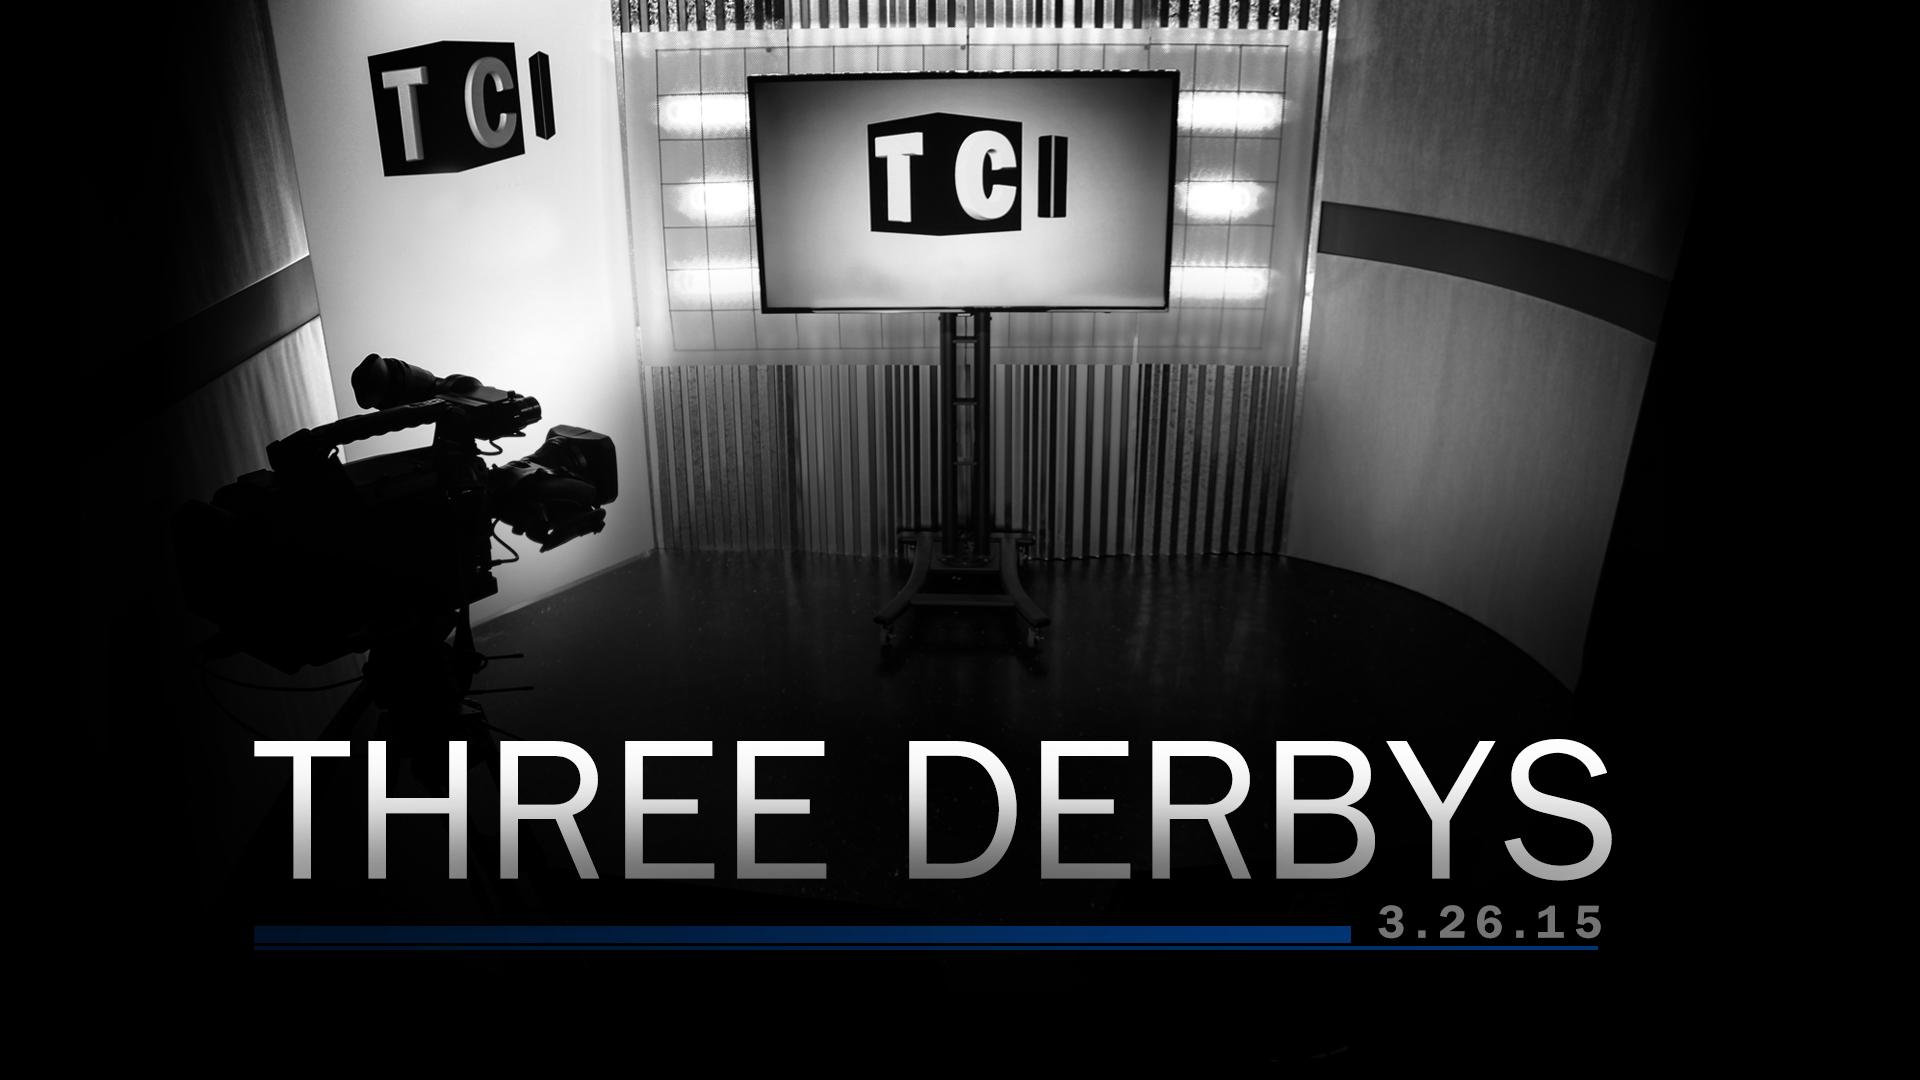 Florida Derby, Louisiana Derby, & UAE Derby preview